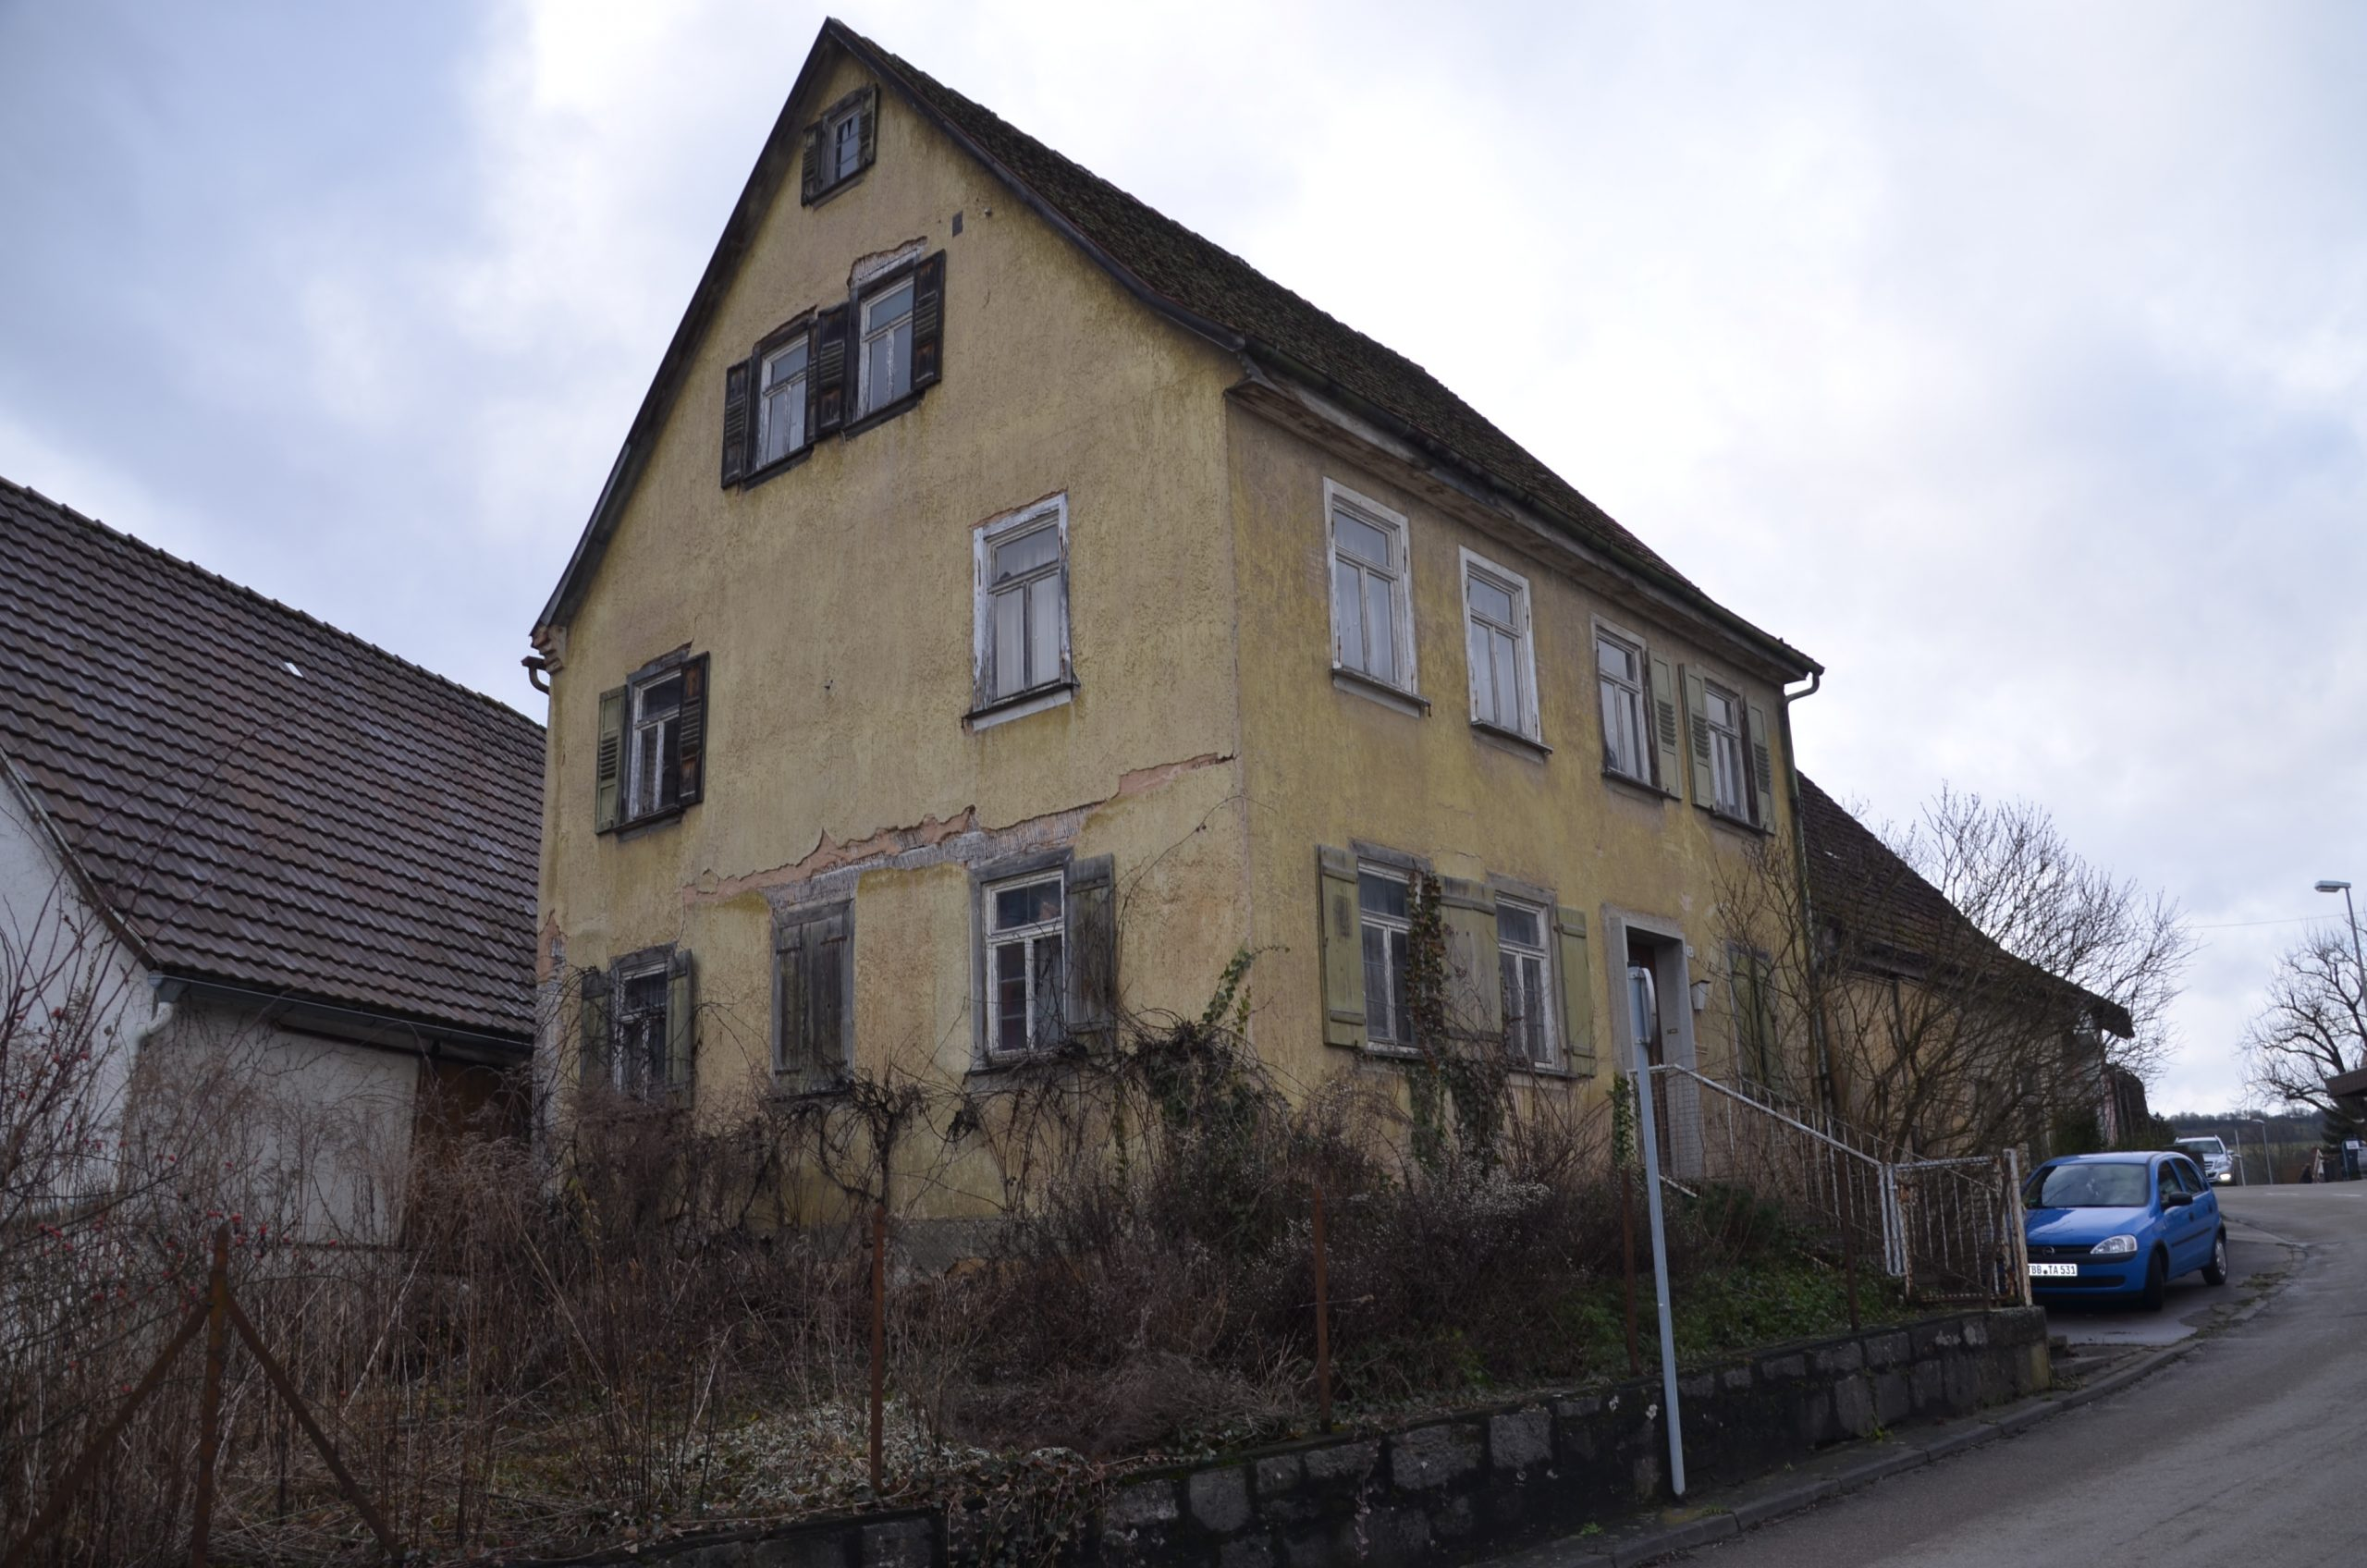 Denkmalschutz, Baudenkmale + sonstige besonders erhaltenswerte Bausubstanz